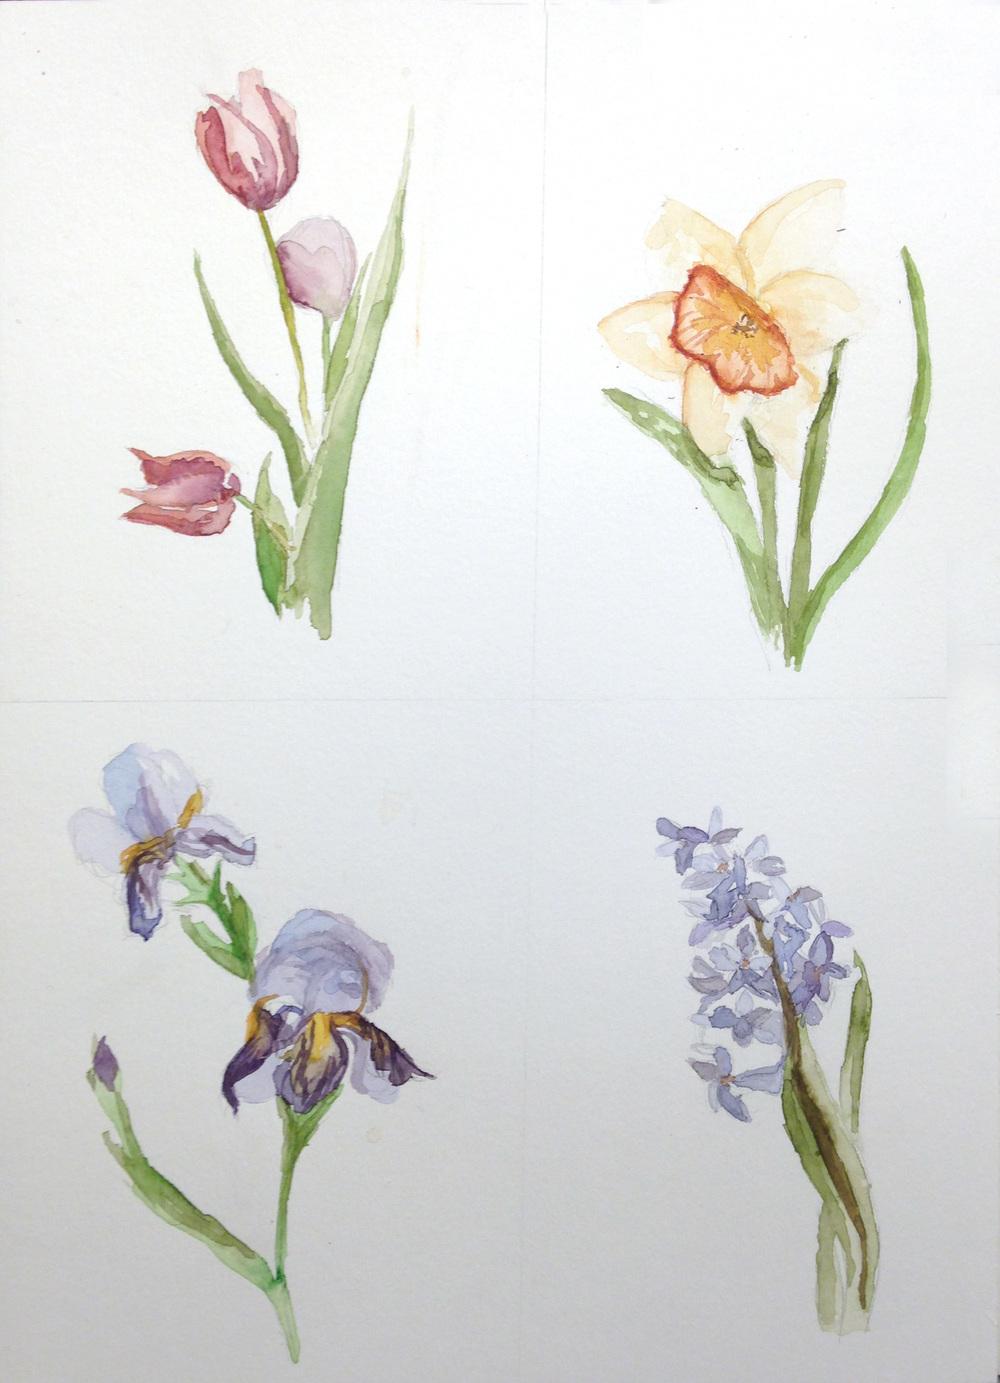 Tulip|Daffodil|Iris|Hyacinth